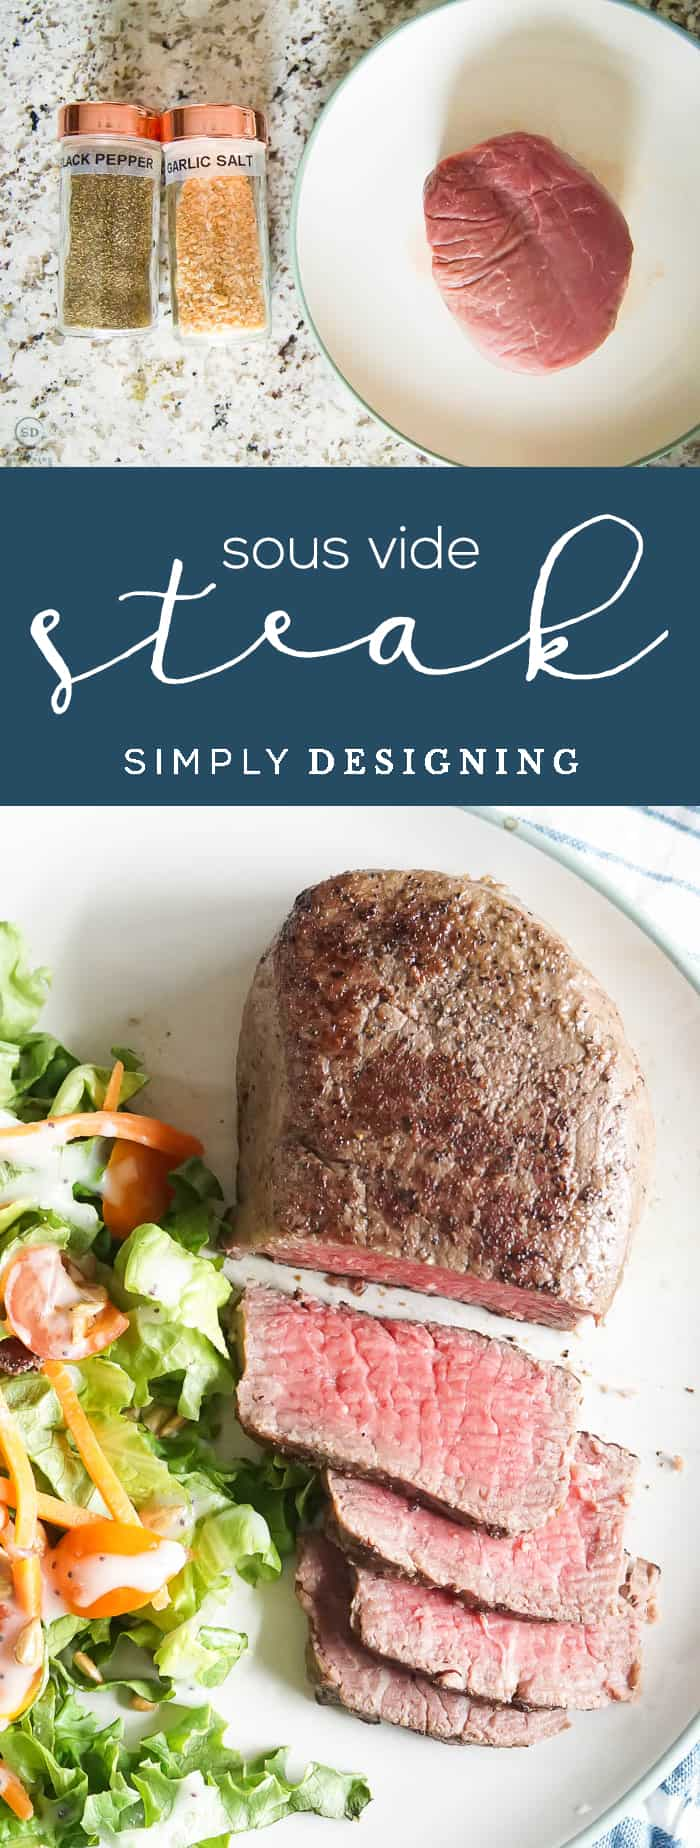 Sous Vide Steak - sous vide steak recipe - how to cook steak with sous vide